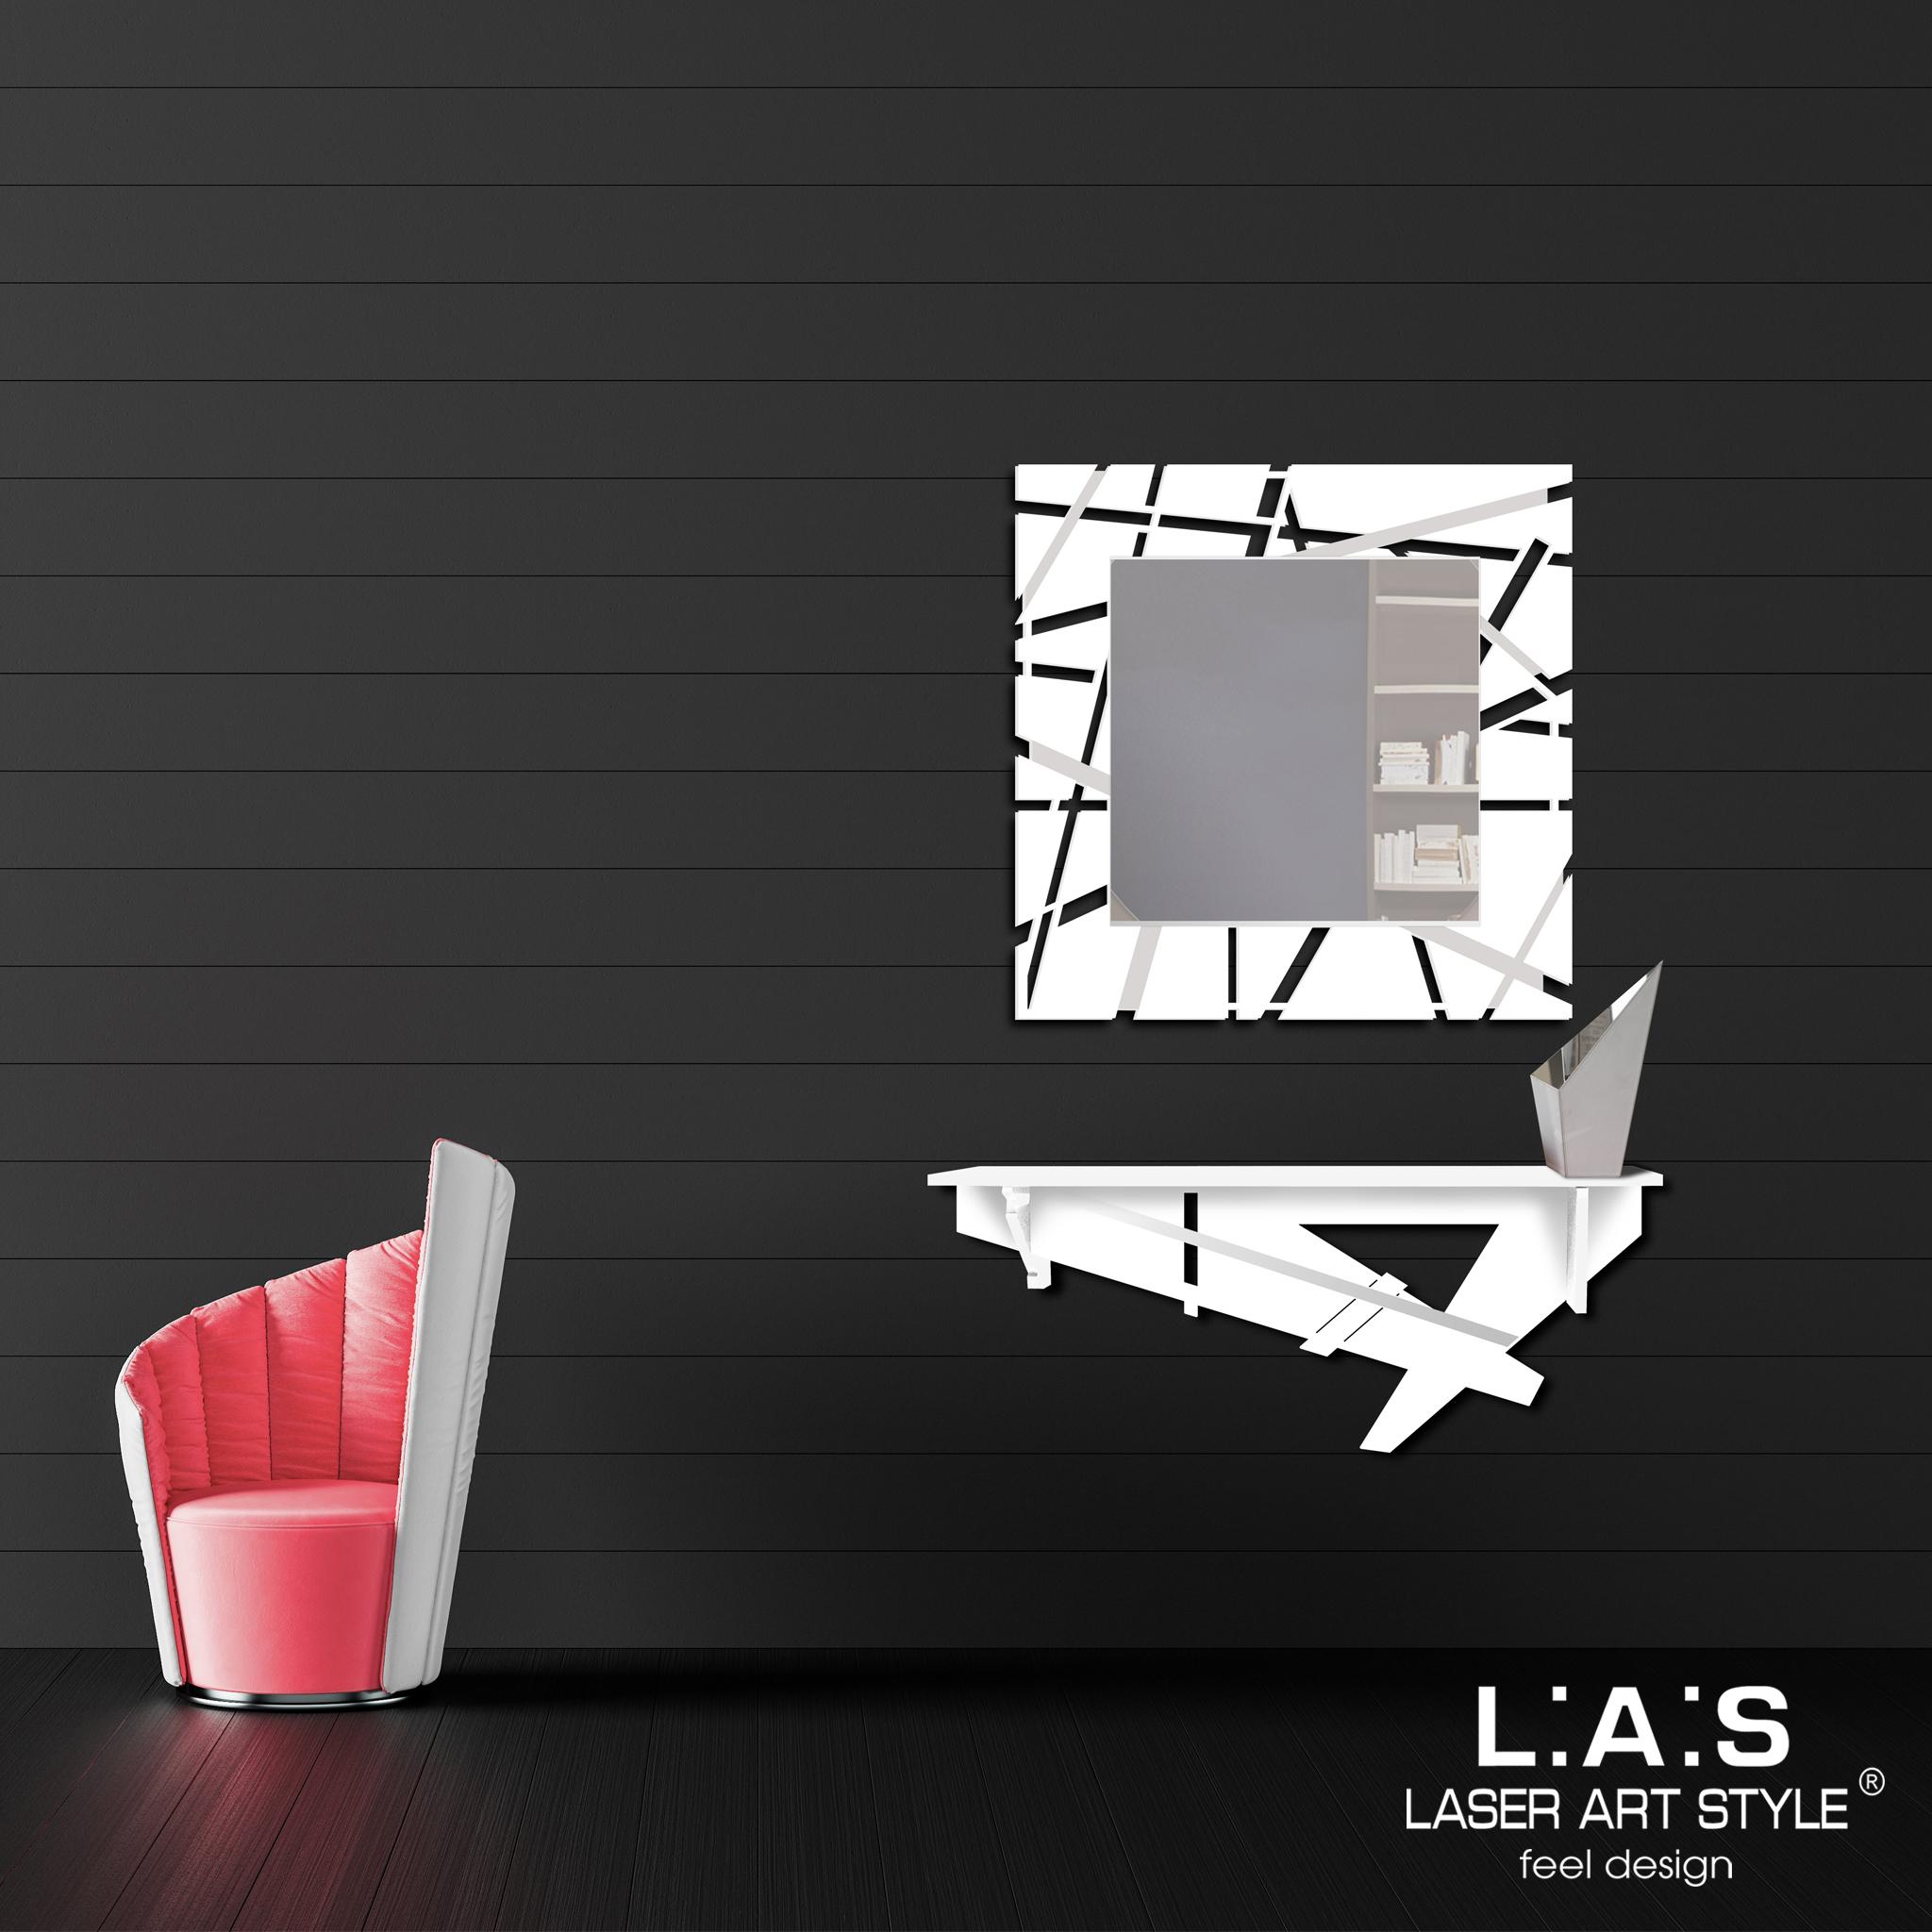 L:A:S - Laser Art Style - CONSOLLE INGRESSO – DESIGN MINIMAL SI-291 BIANCO-BIANCO